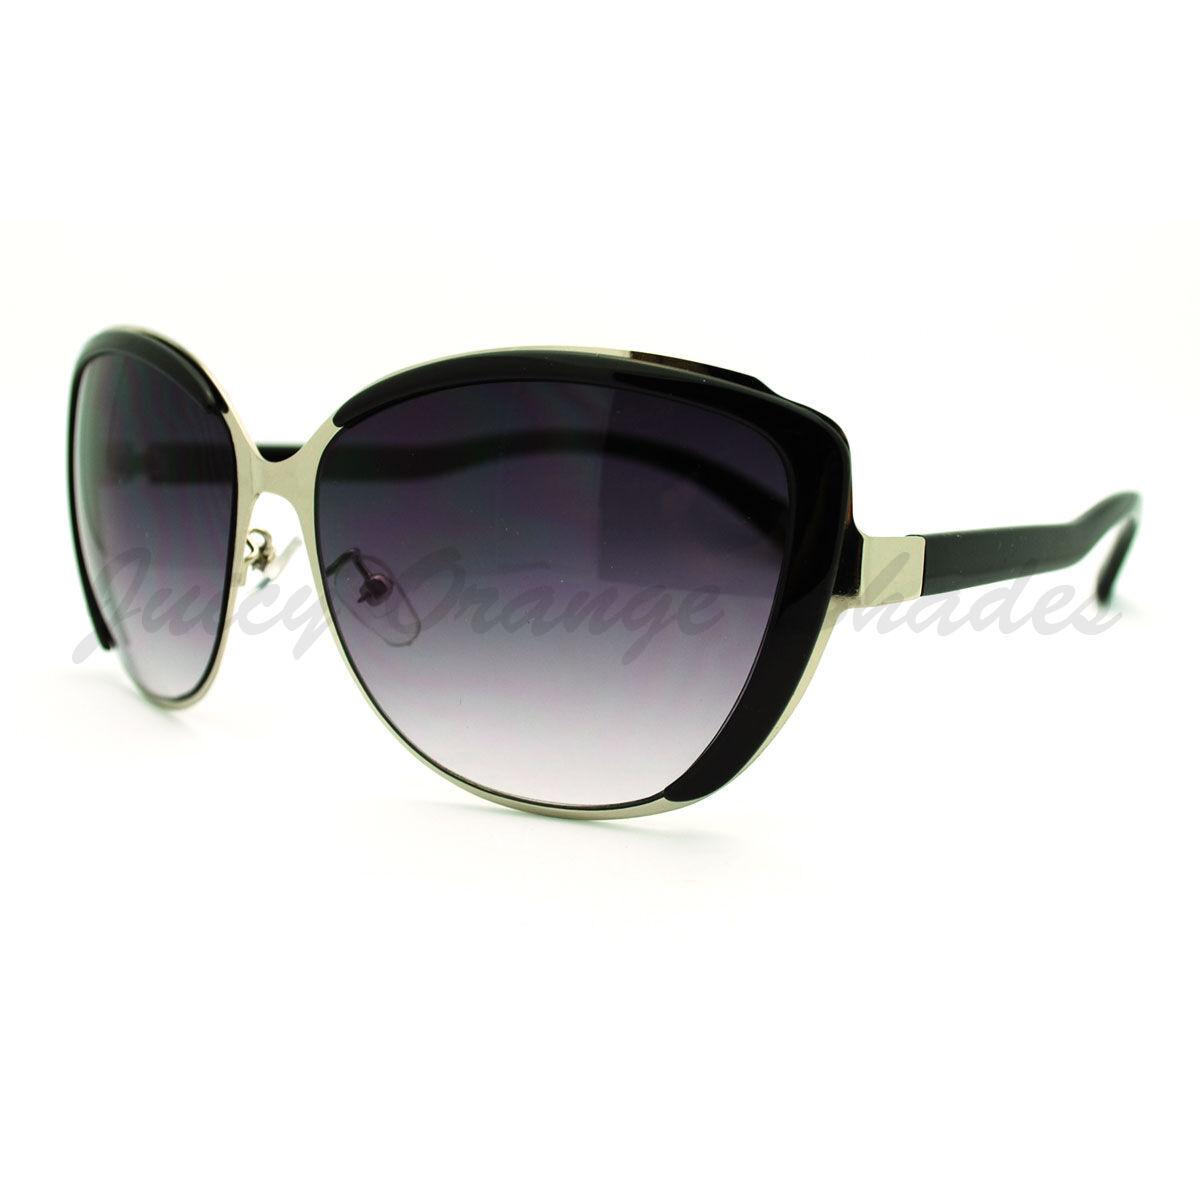 Round Oversized Cateye Sunglasses Womens Designer Fashion Shades